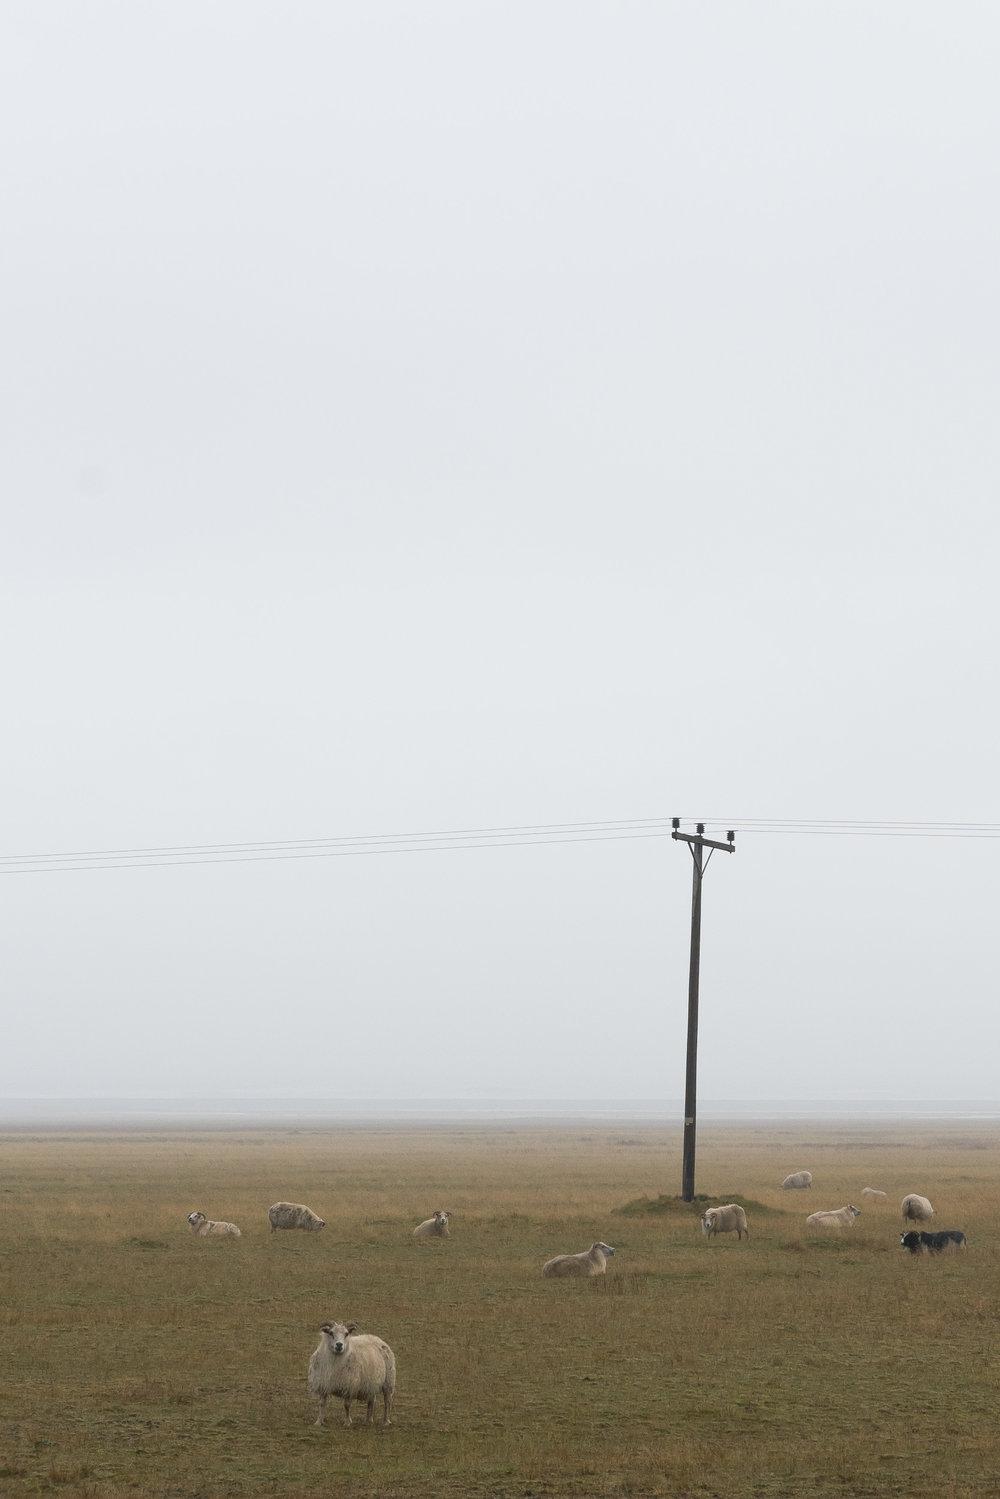 iceland_sheep-1.jpg